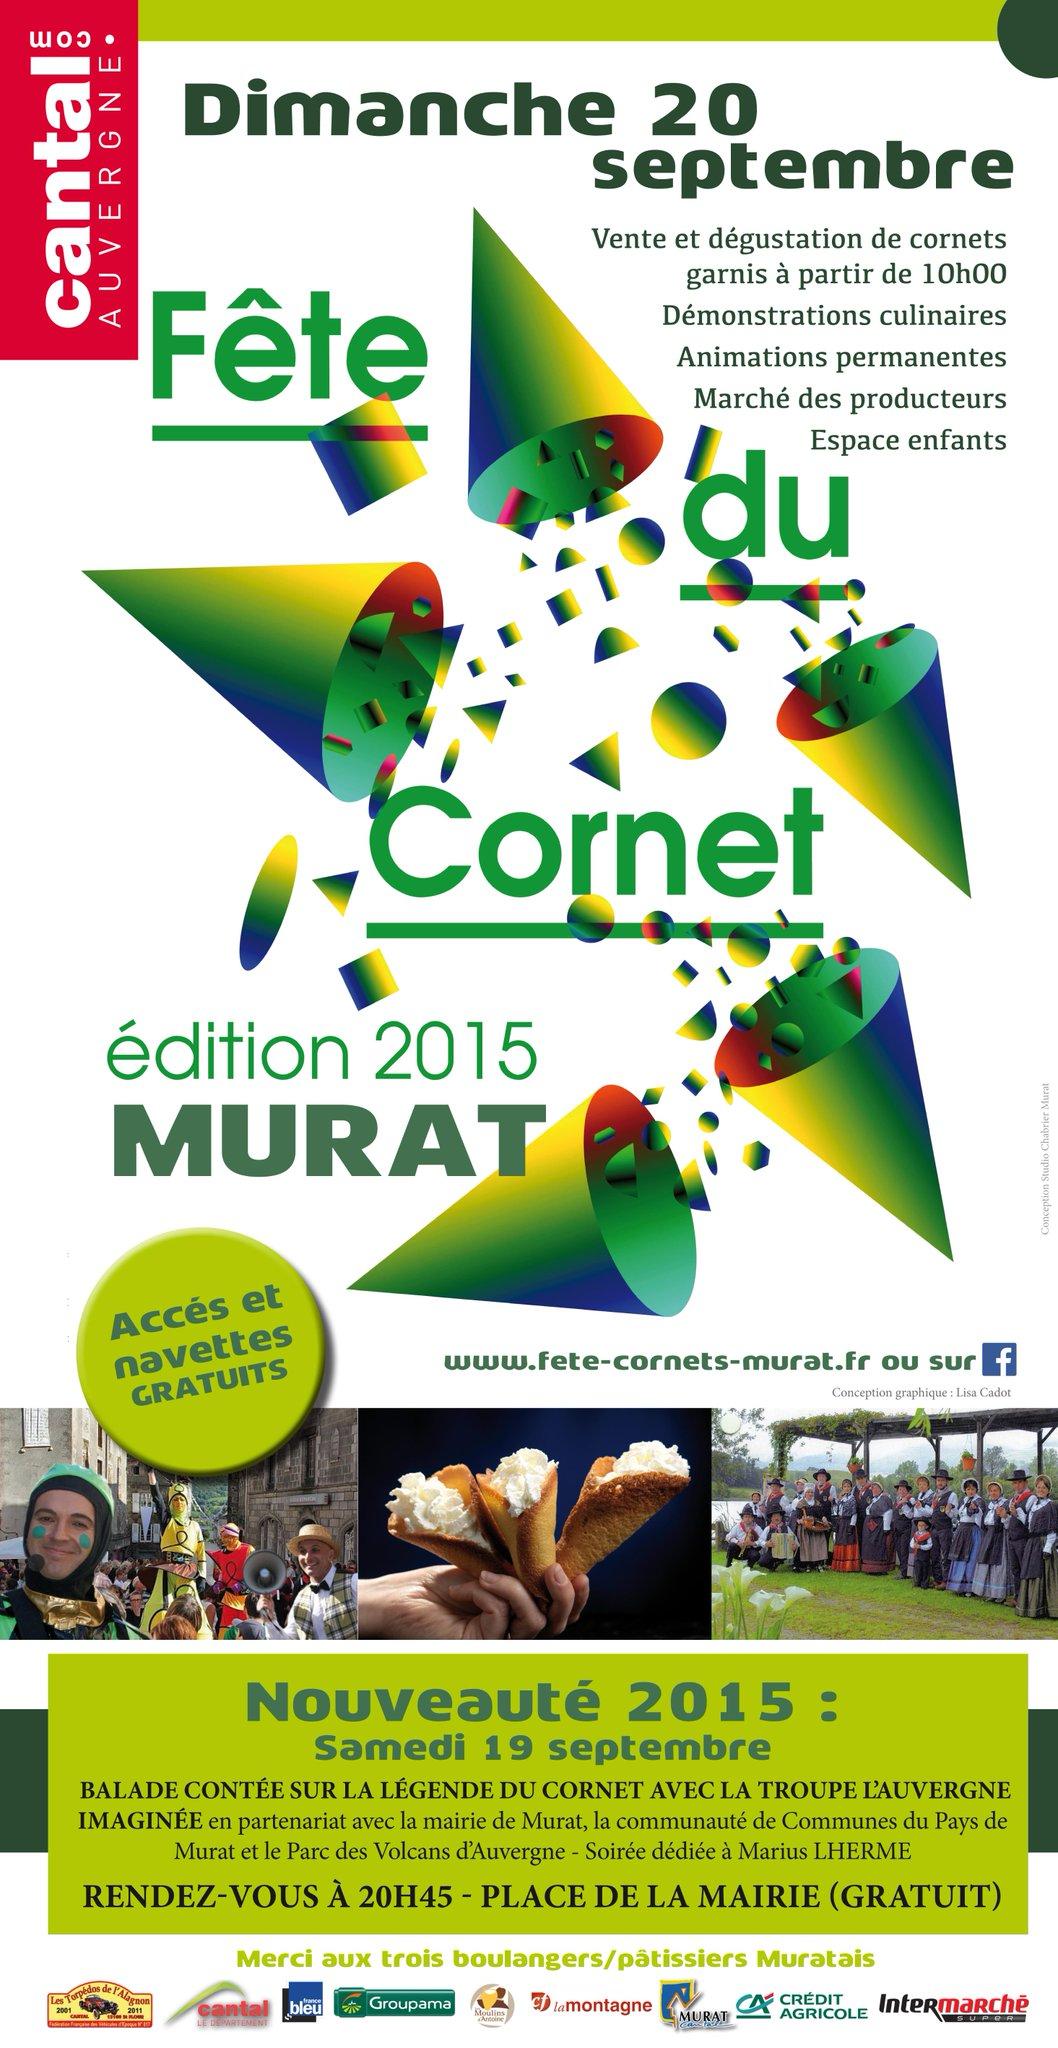 Fête du cornet de Murat 2015 CNR0LWuWoAASd3o